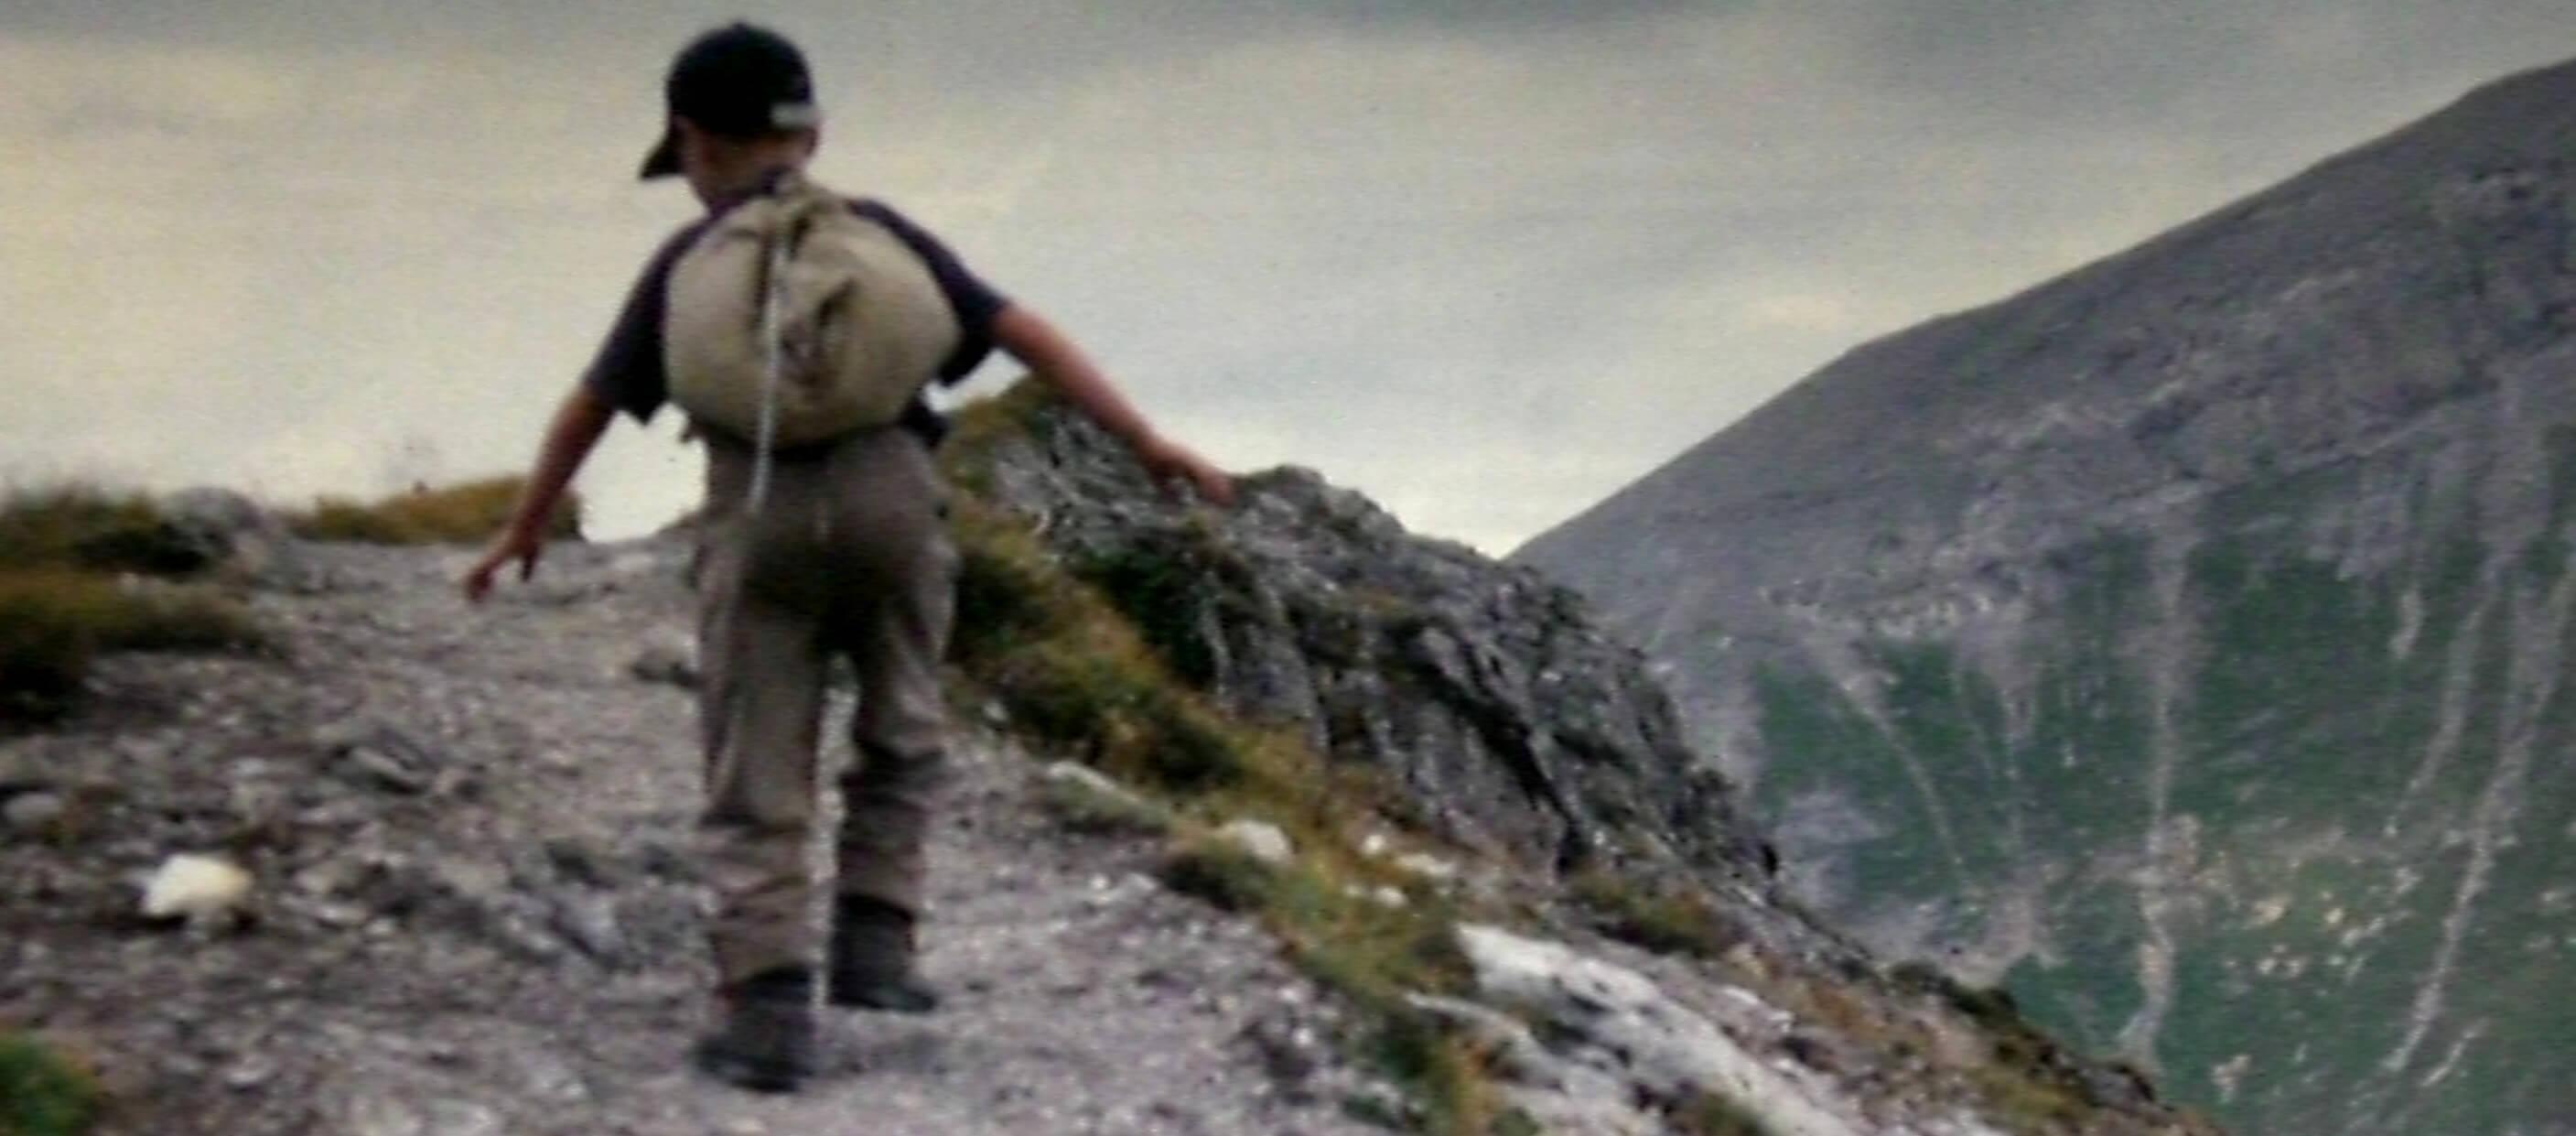 bergschuhe-trekkingschuhe-kinder-wandern